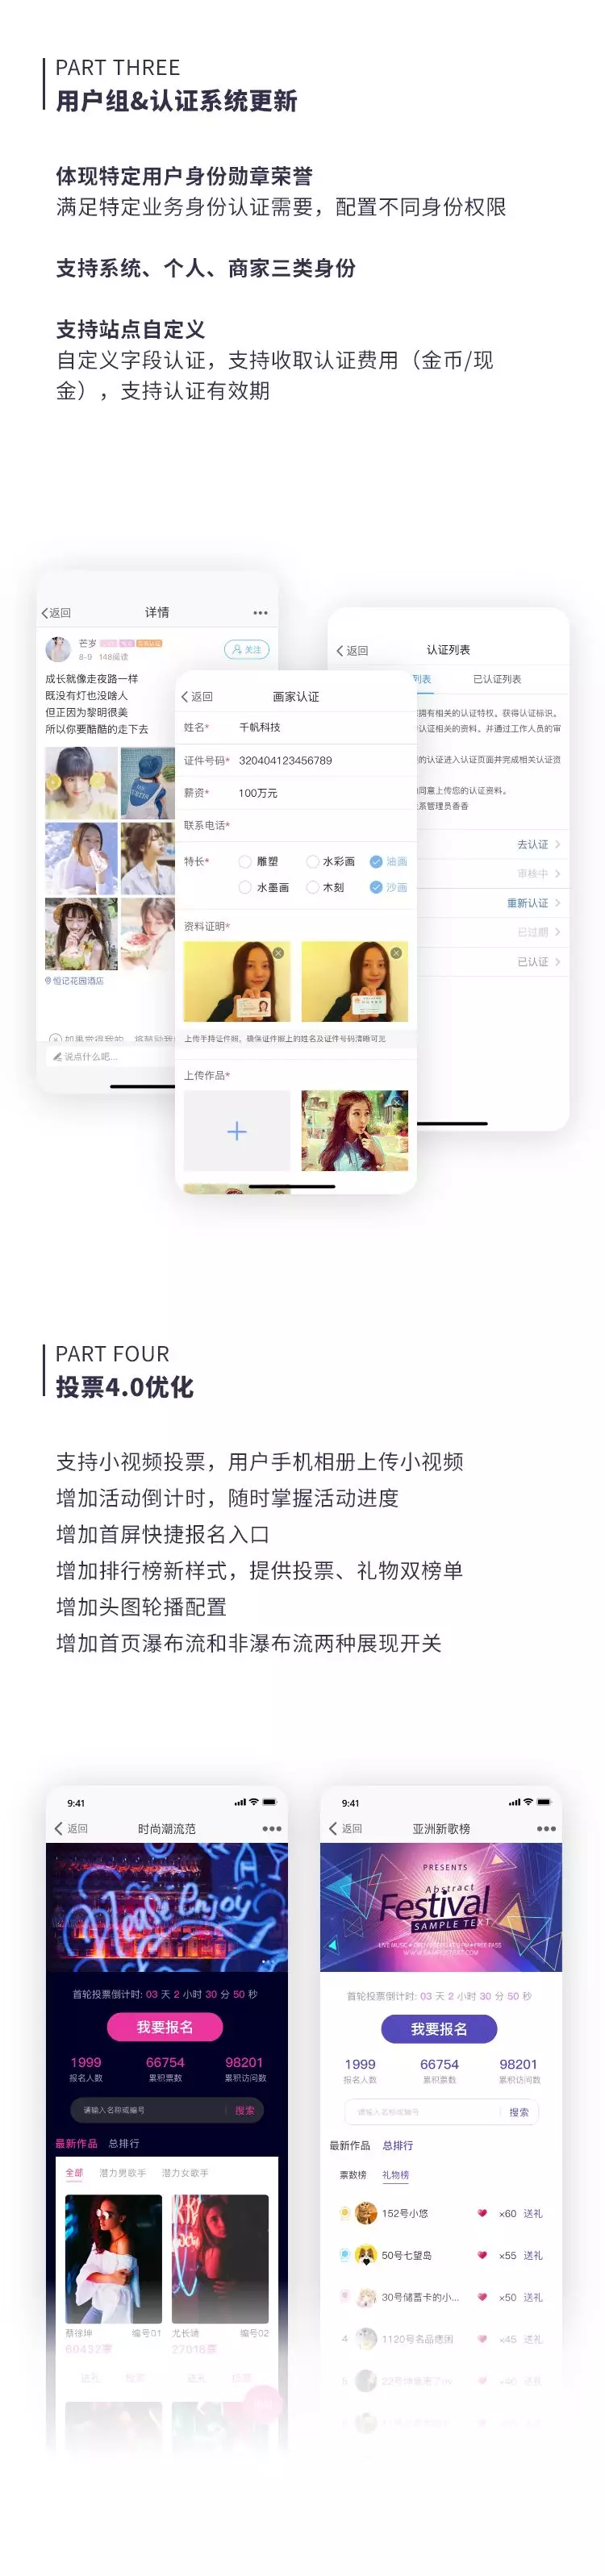 QQ图片20181017134446.png